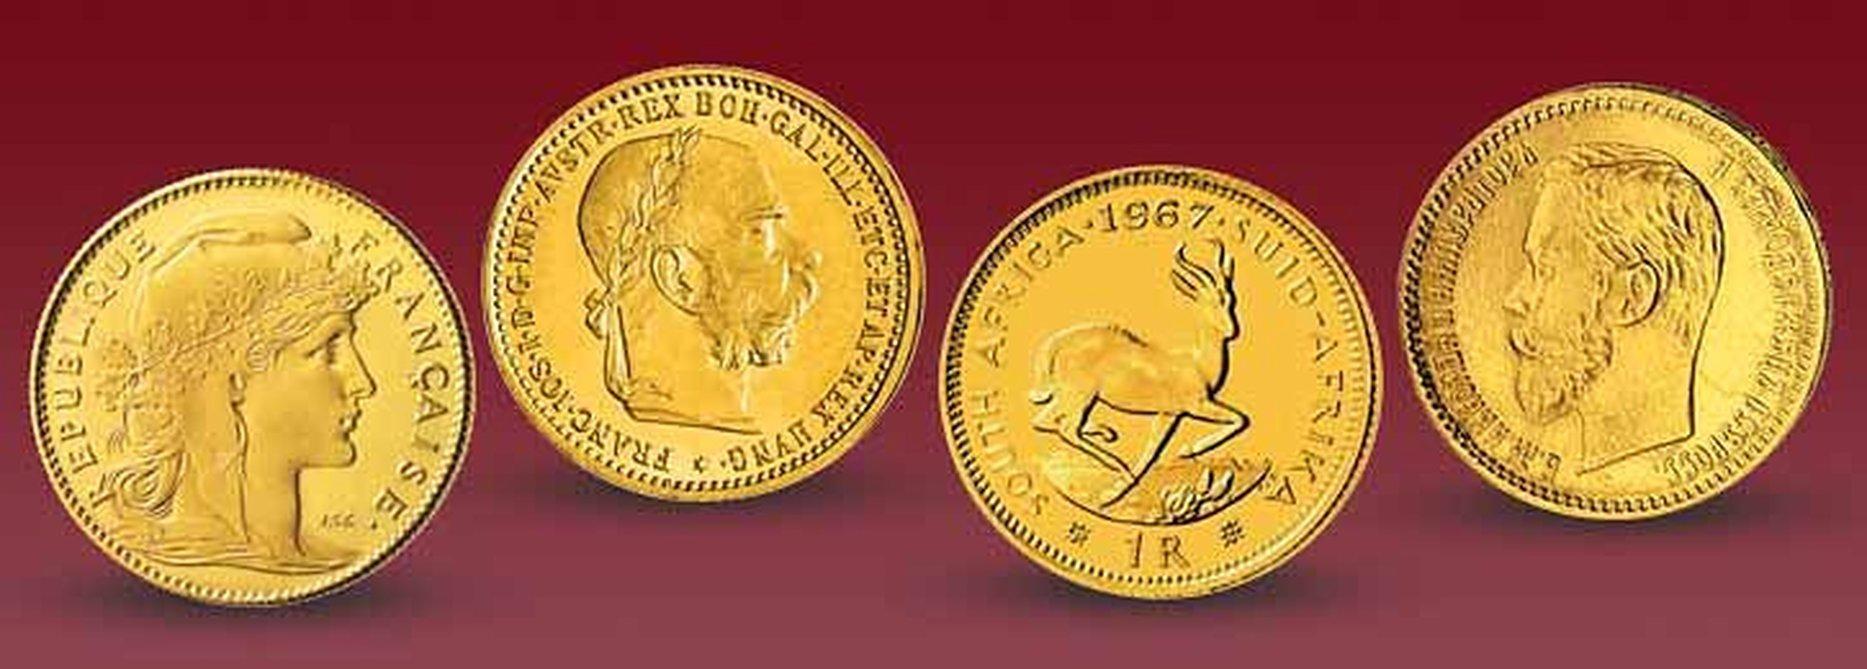 Berühmtesten Goldmünzen Der Welt Mdm Deutsche Münze